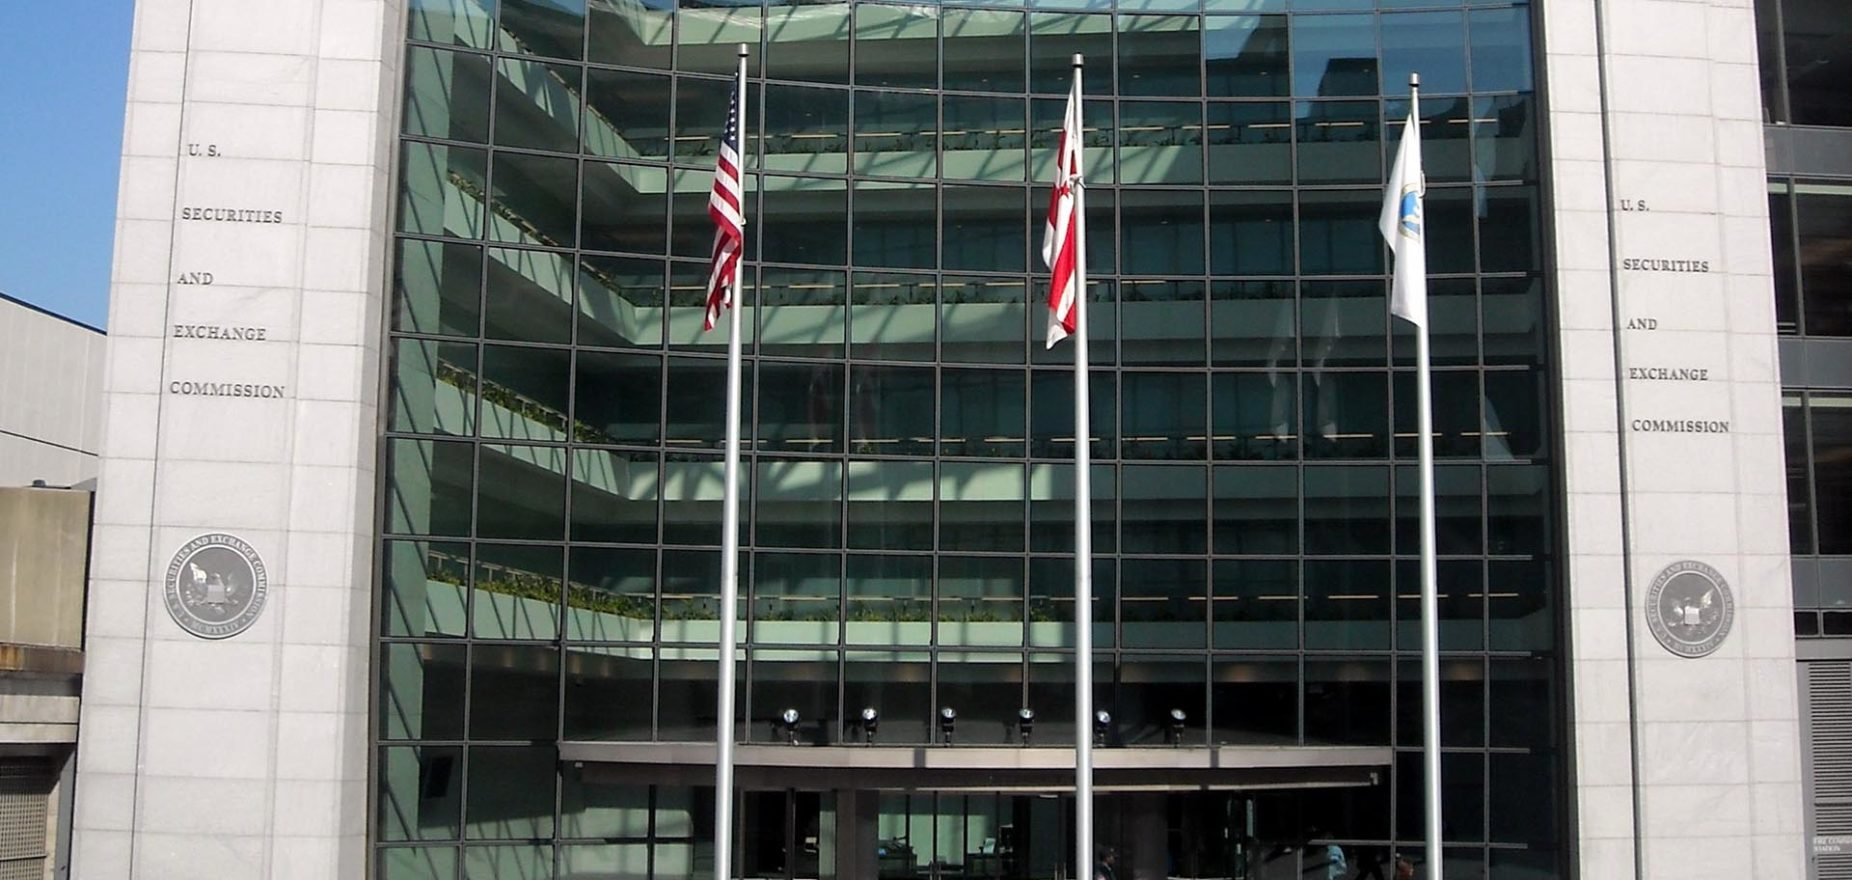 SEC headquarters government shutdown